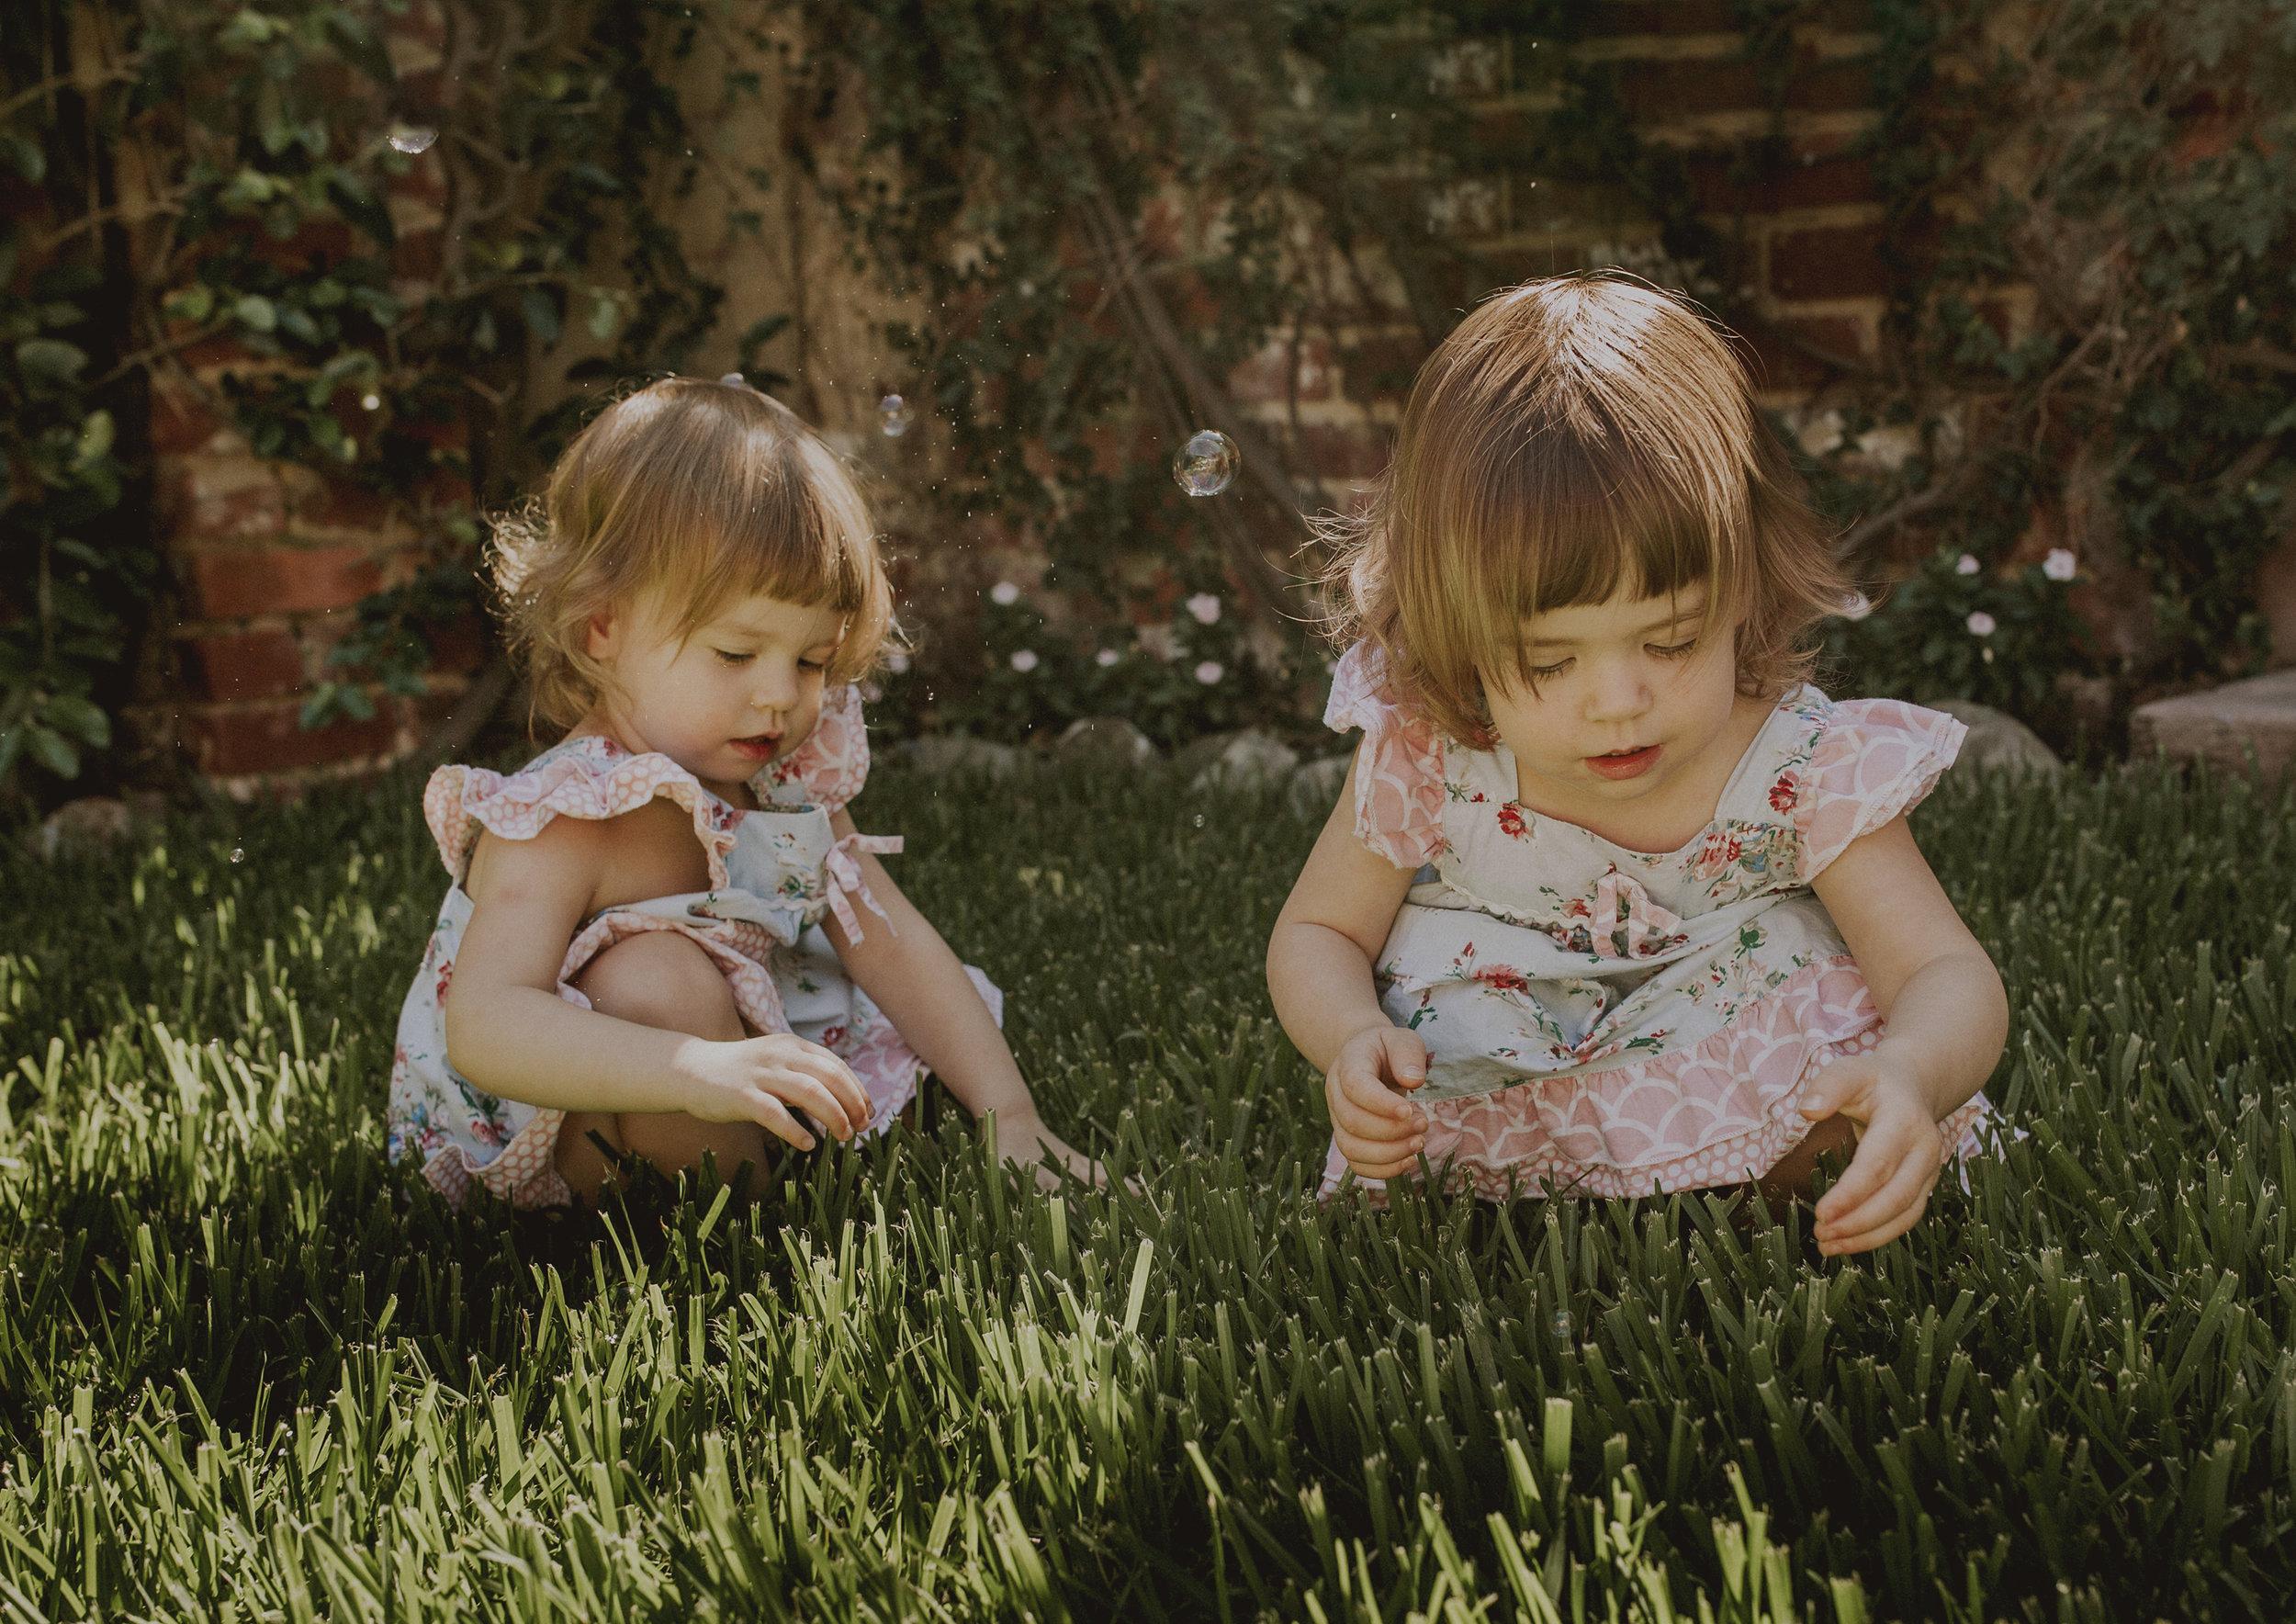 Twin girls playing in their backyard!